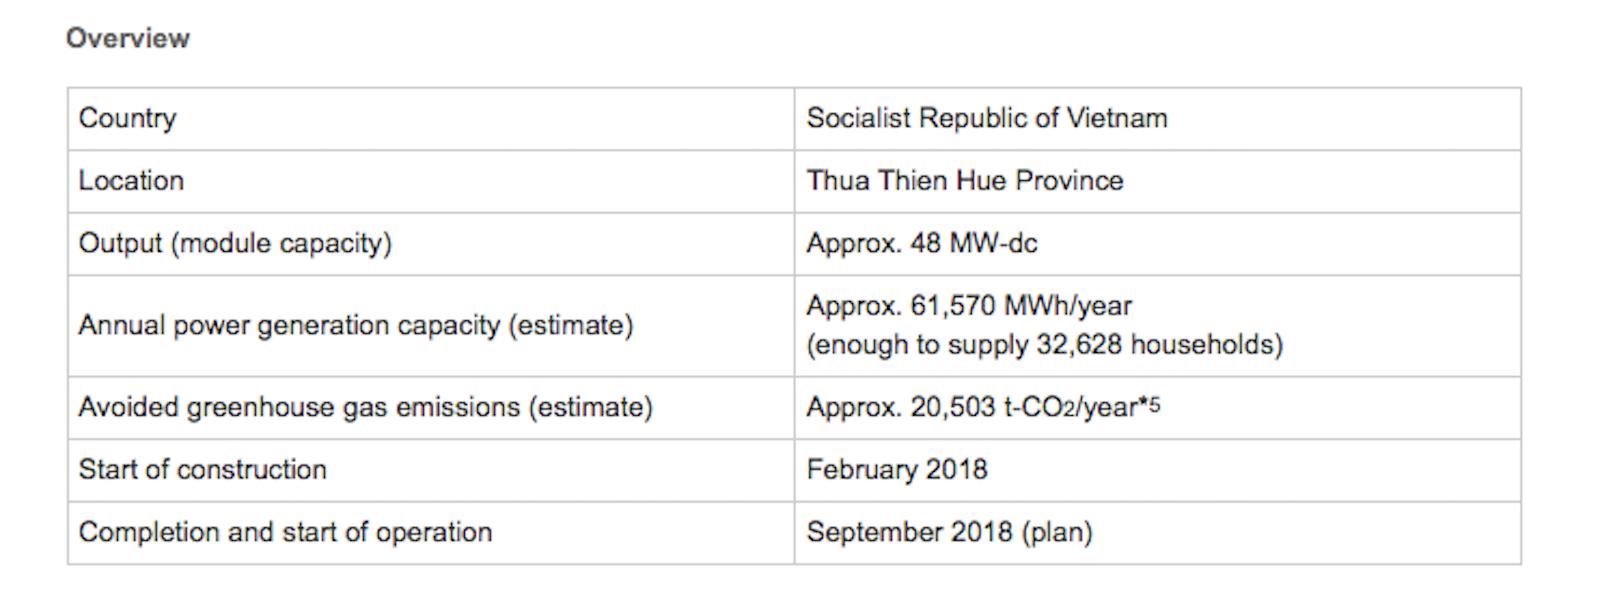 Sharp to construct mega solar power plant in Vietnam | Off